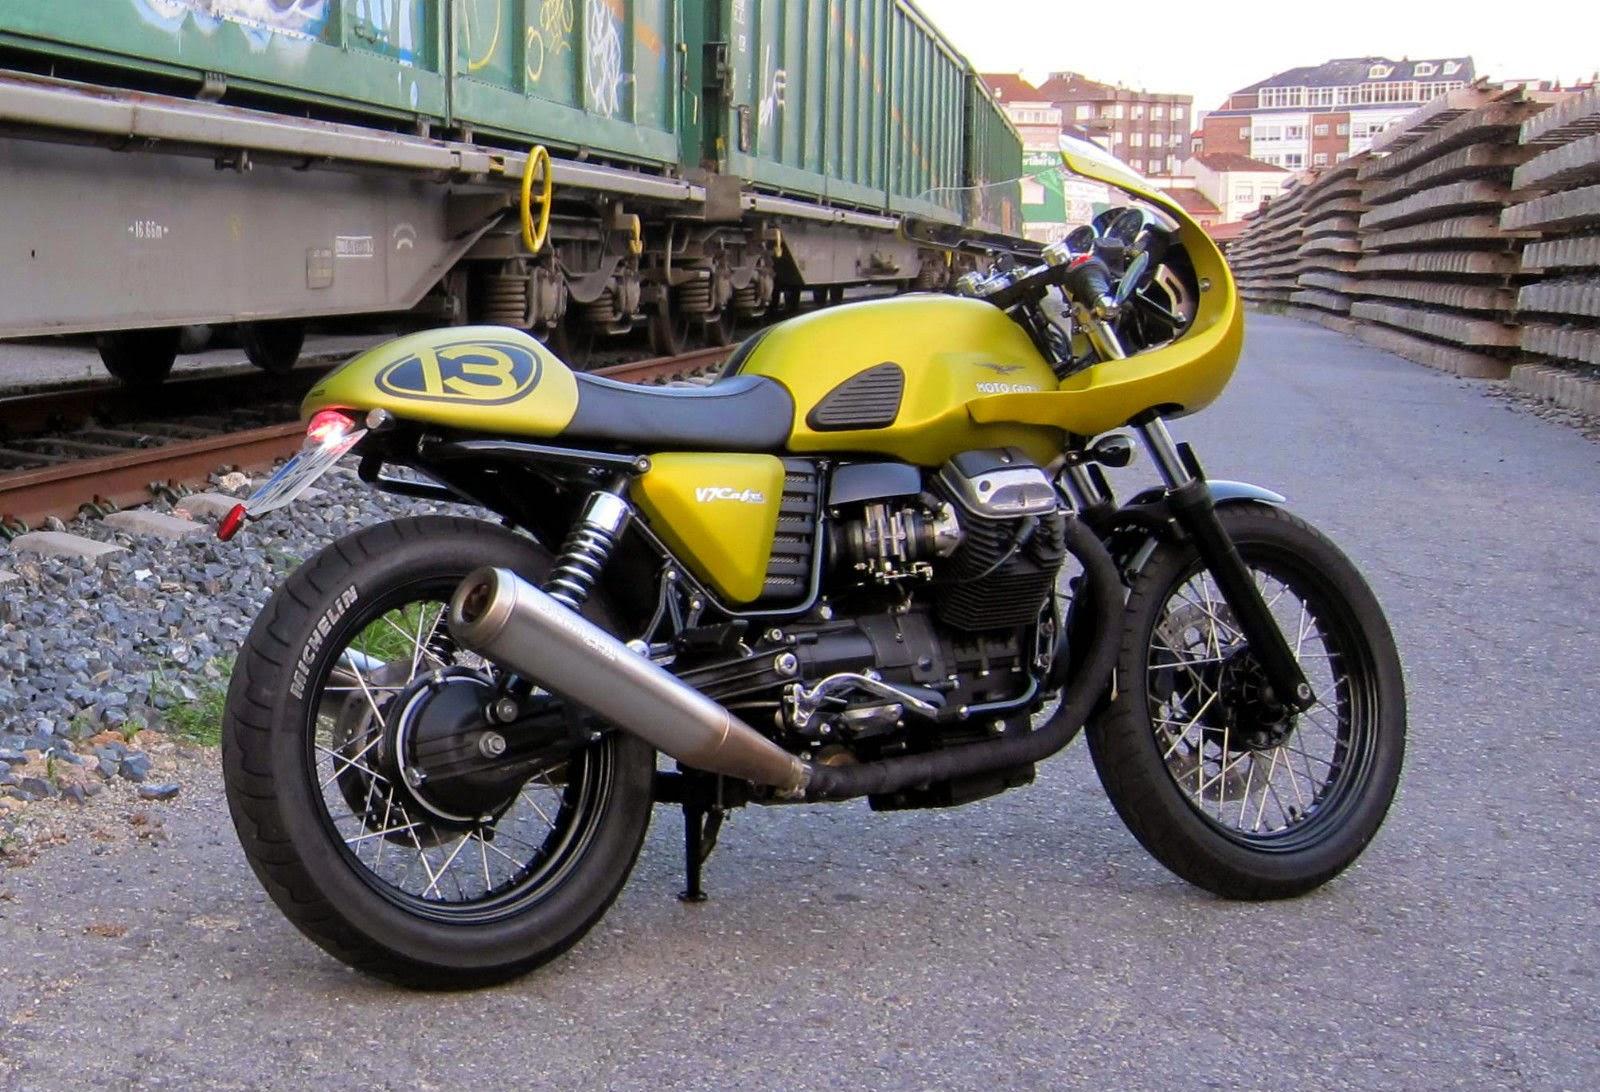 Moto Guzzi Cafe Racer Seat